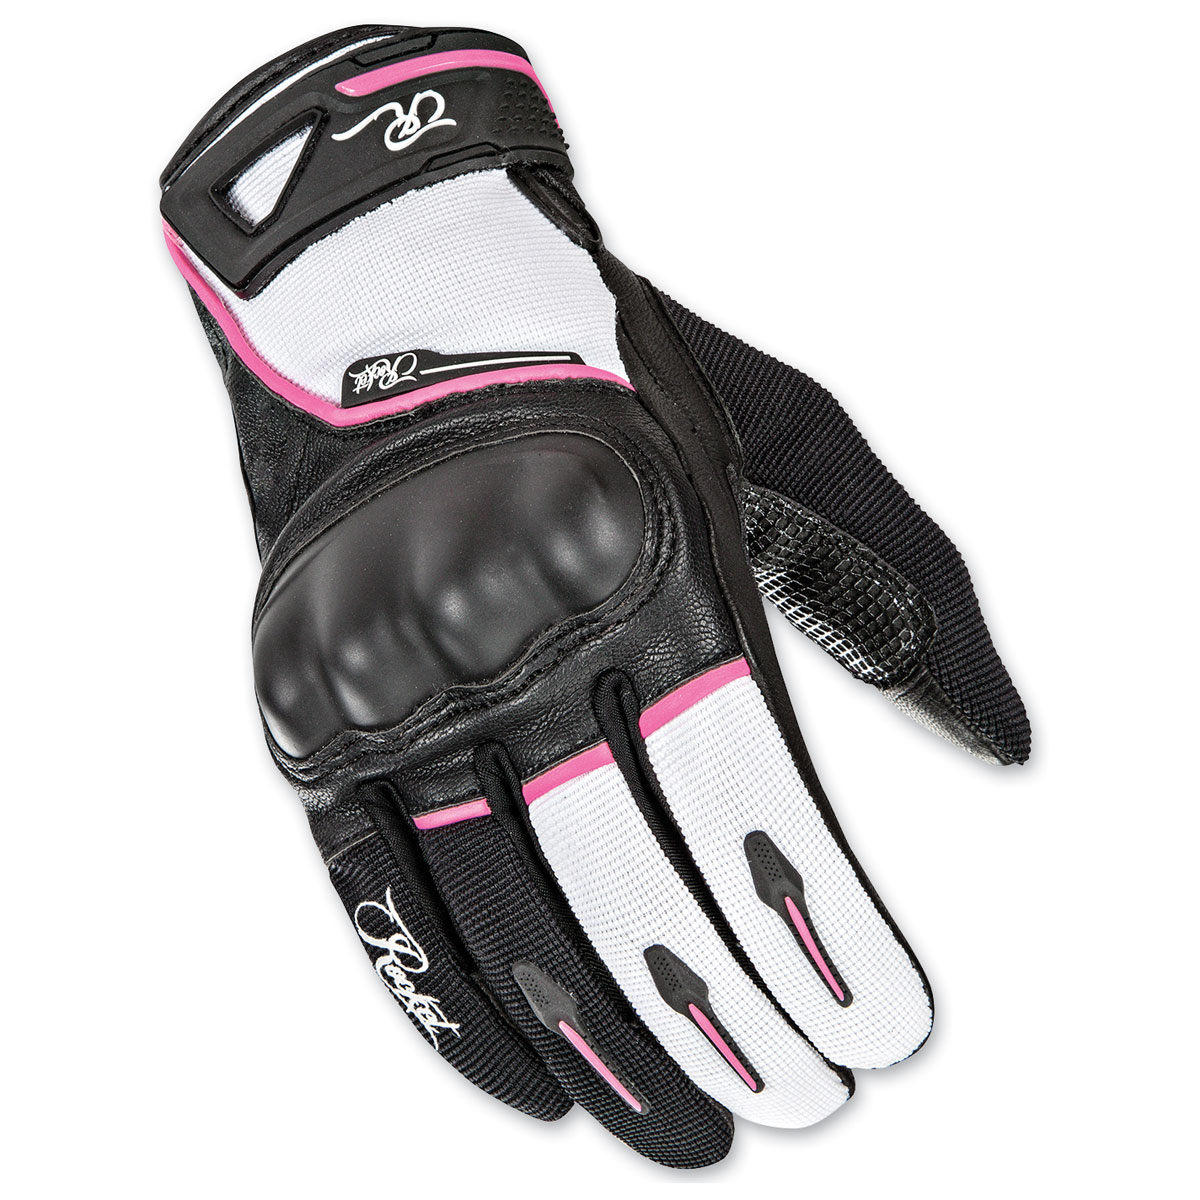 Joe Rocket Women's Super Moto Black/White/Pink Gloves